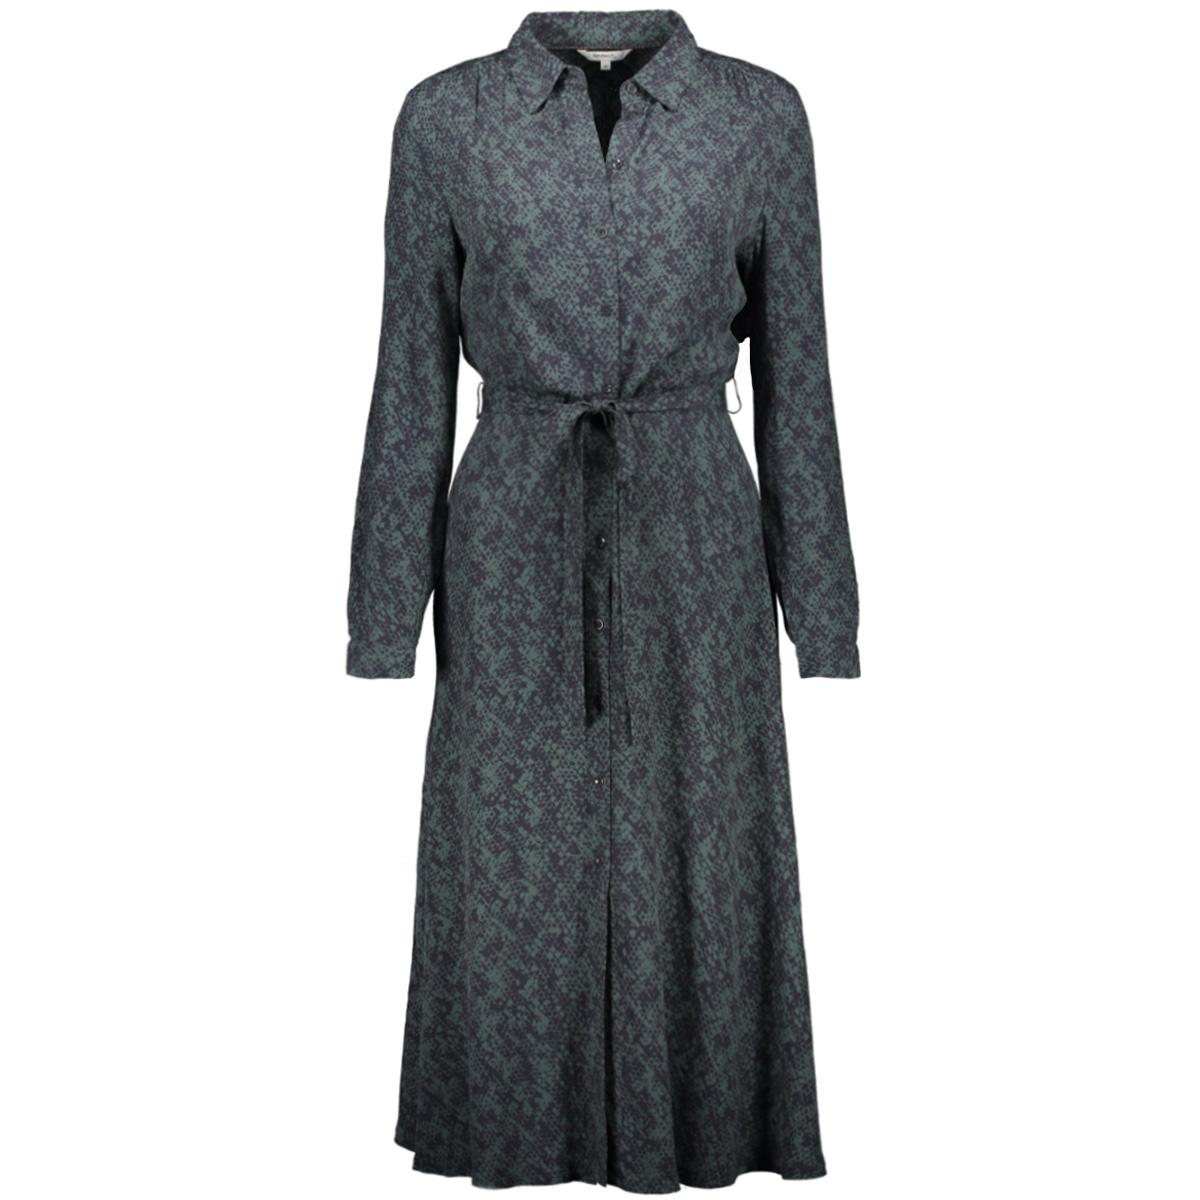 jurk met slangen print 23001628 sandwich jurk 50044